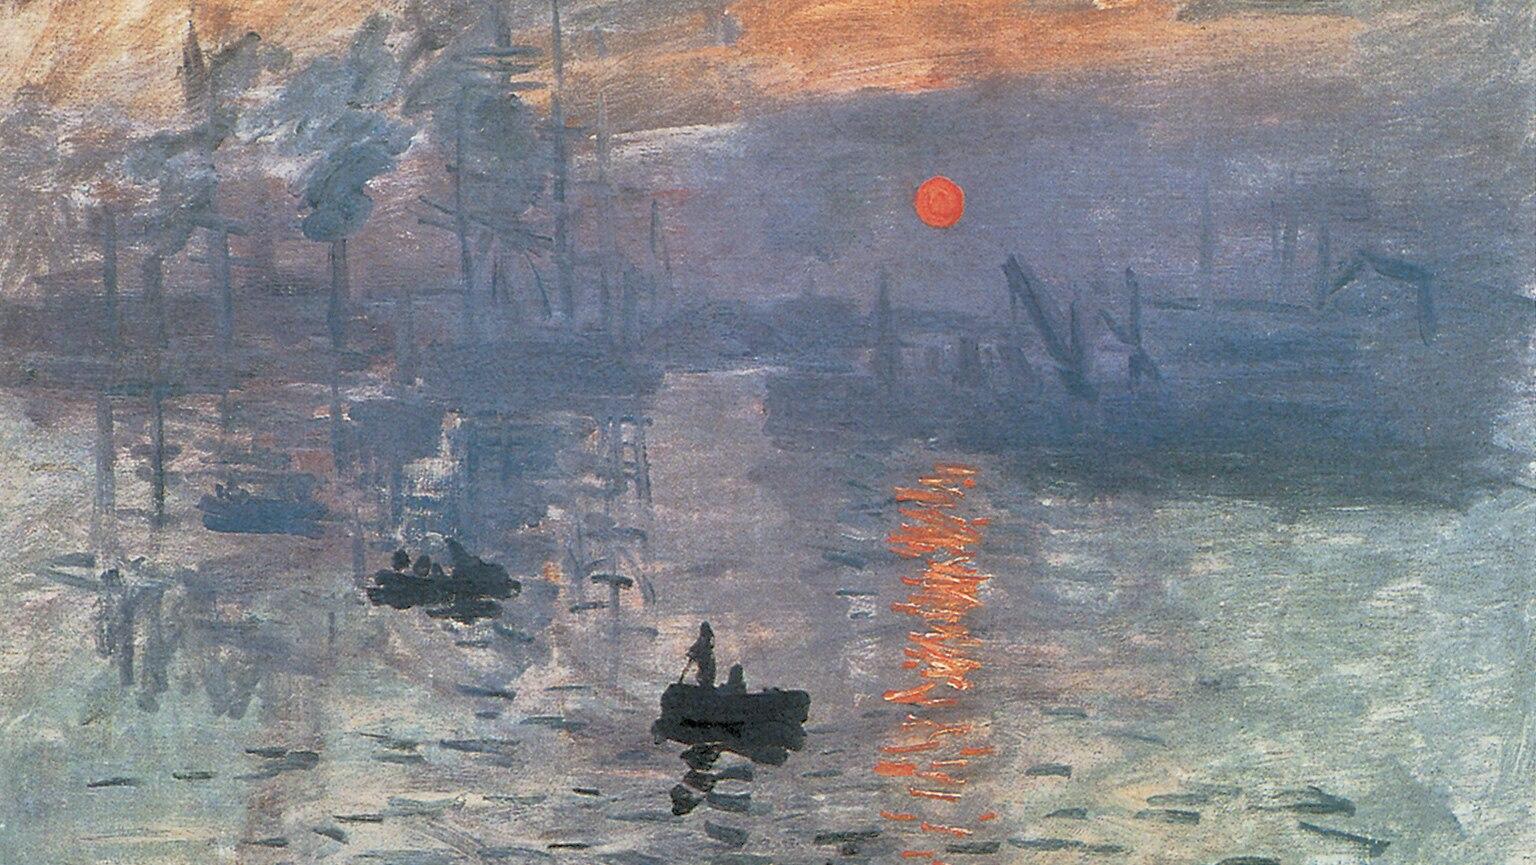 manet and monet u2014the birth of impressionism